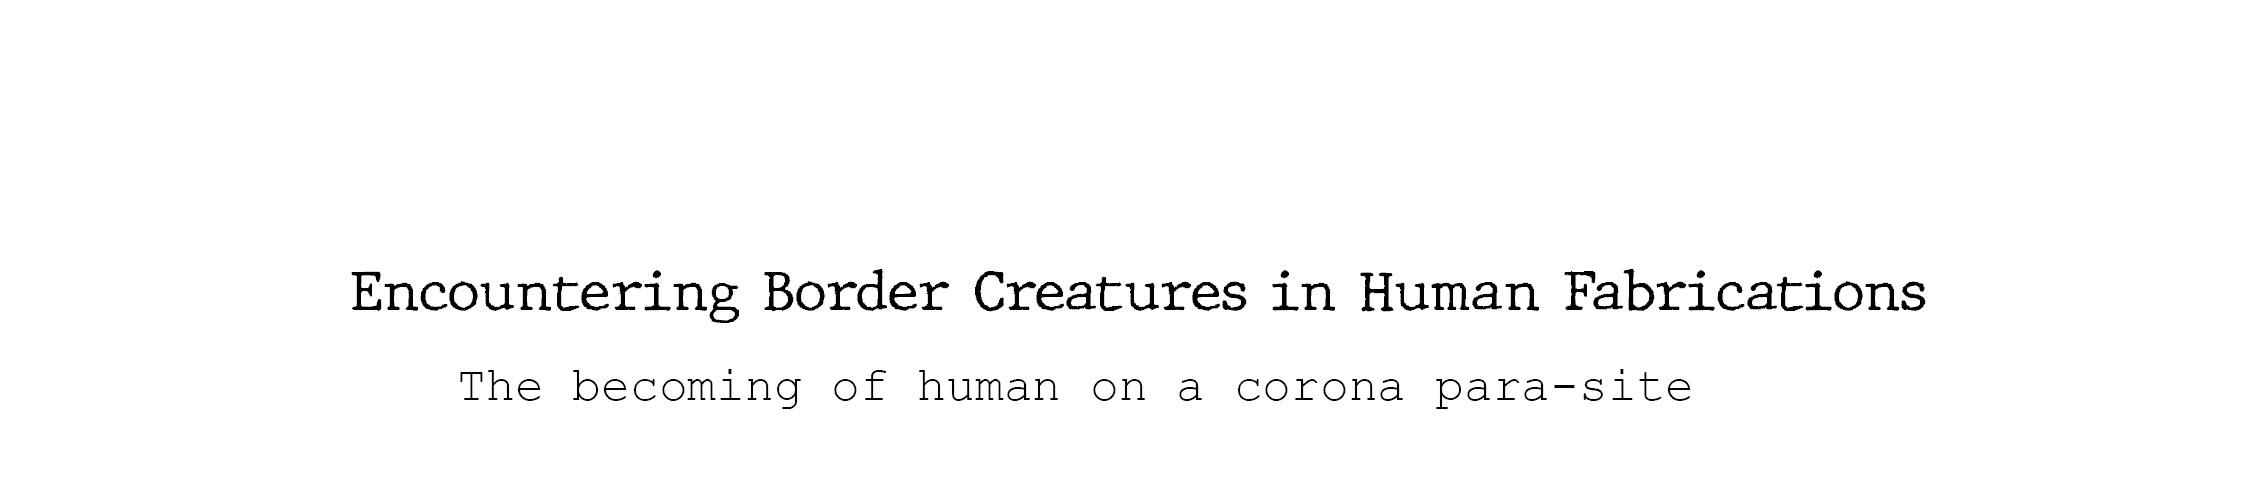 Title_encounter border creatures